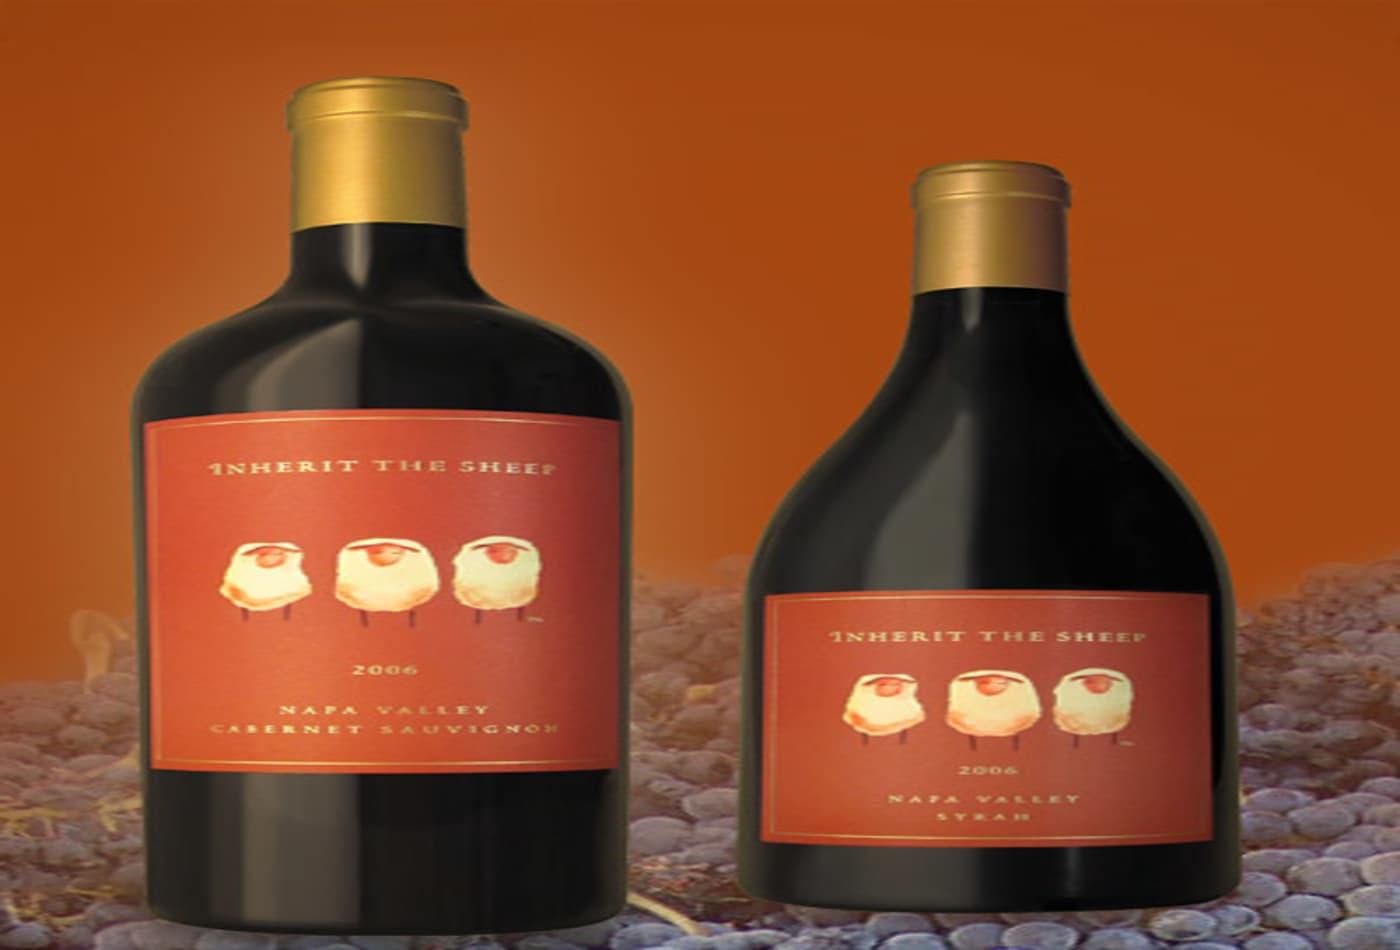 Unique-Wines-Inherit-the-sheep.jpg